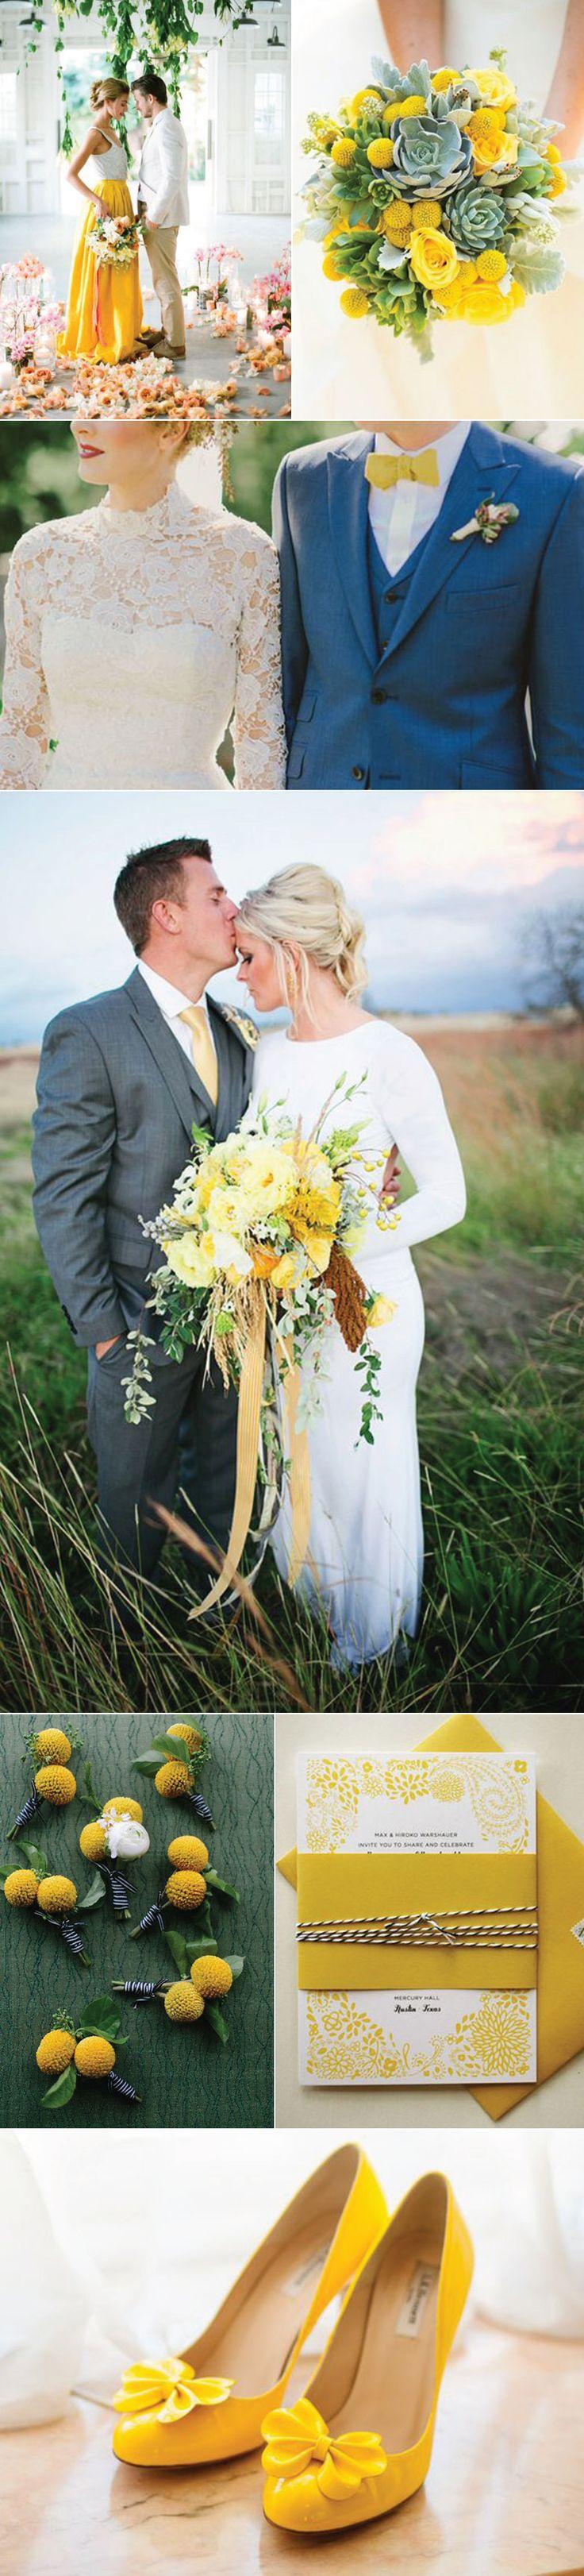 Yellow wedding inspiration. The yellow ties on these groomsmen look so good.